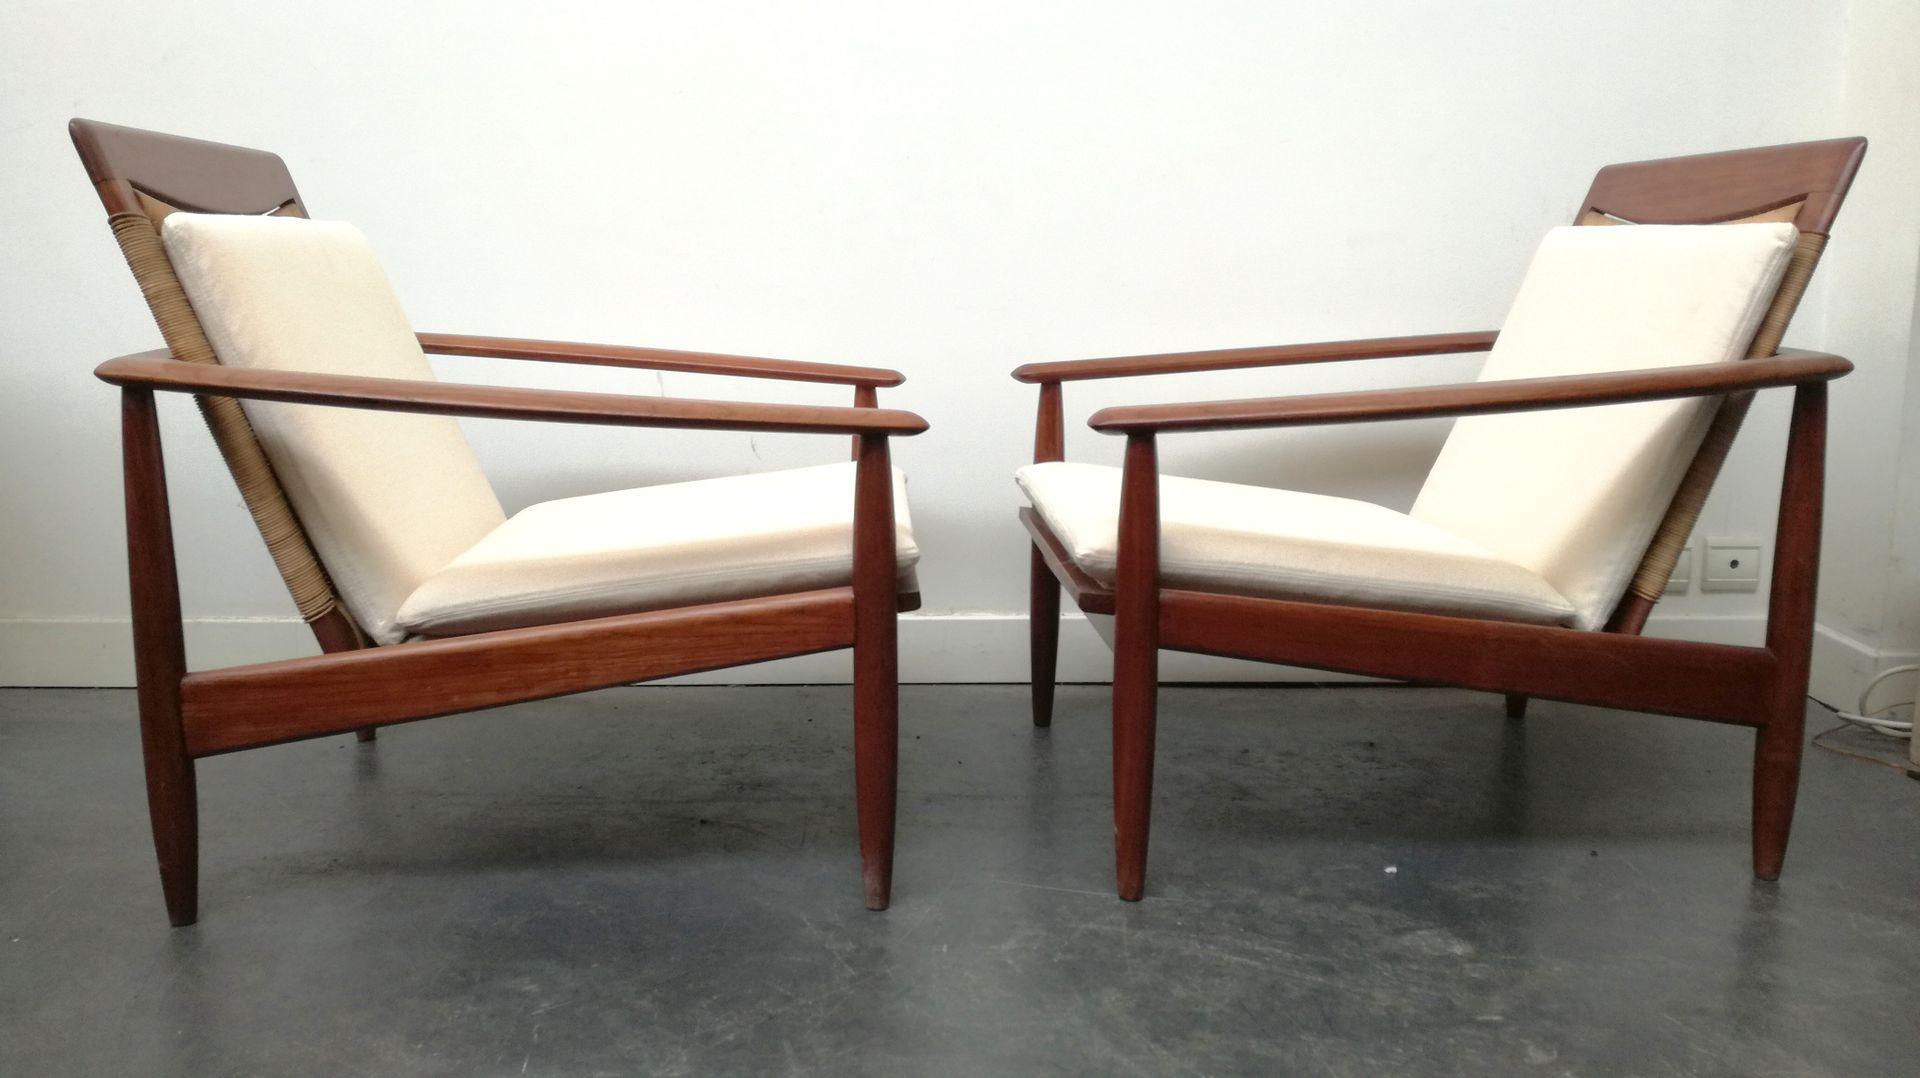 skandinavische teak sessel 1960er 2er set bei pamono kaufen. Black Bedroom Furniture Sets. Home Design Ideas